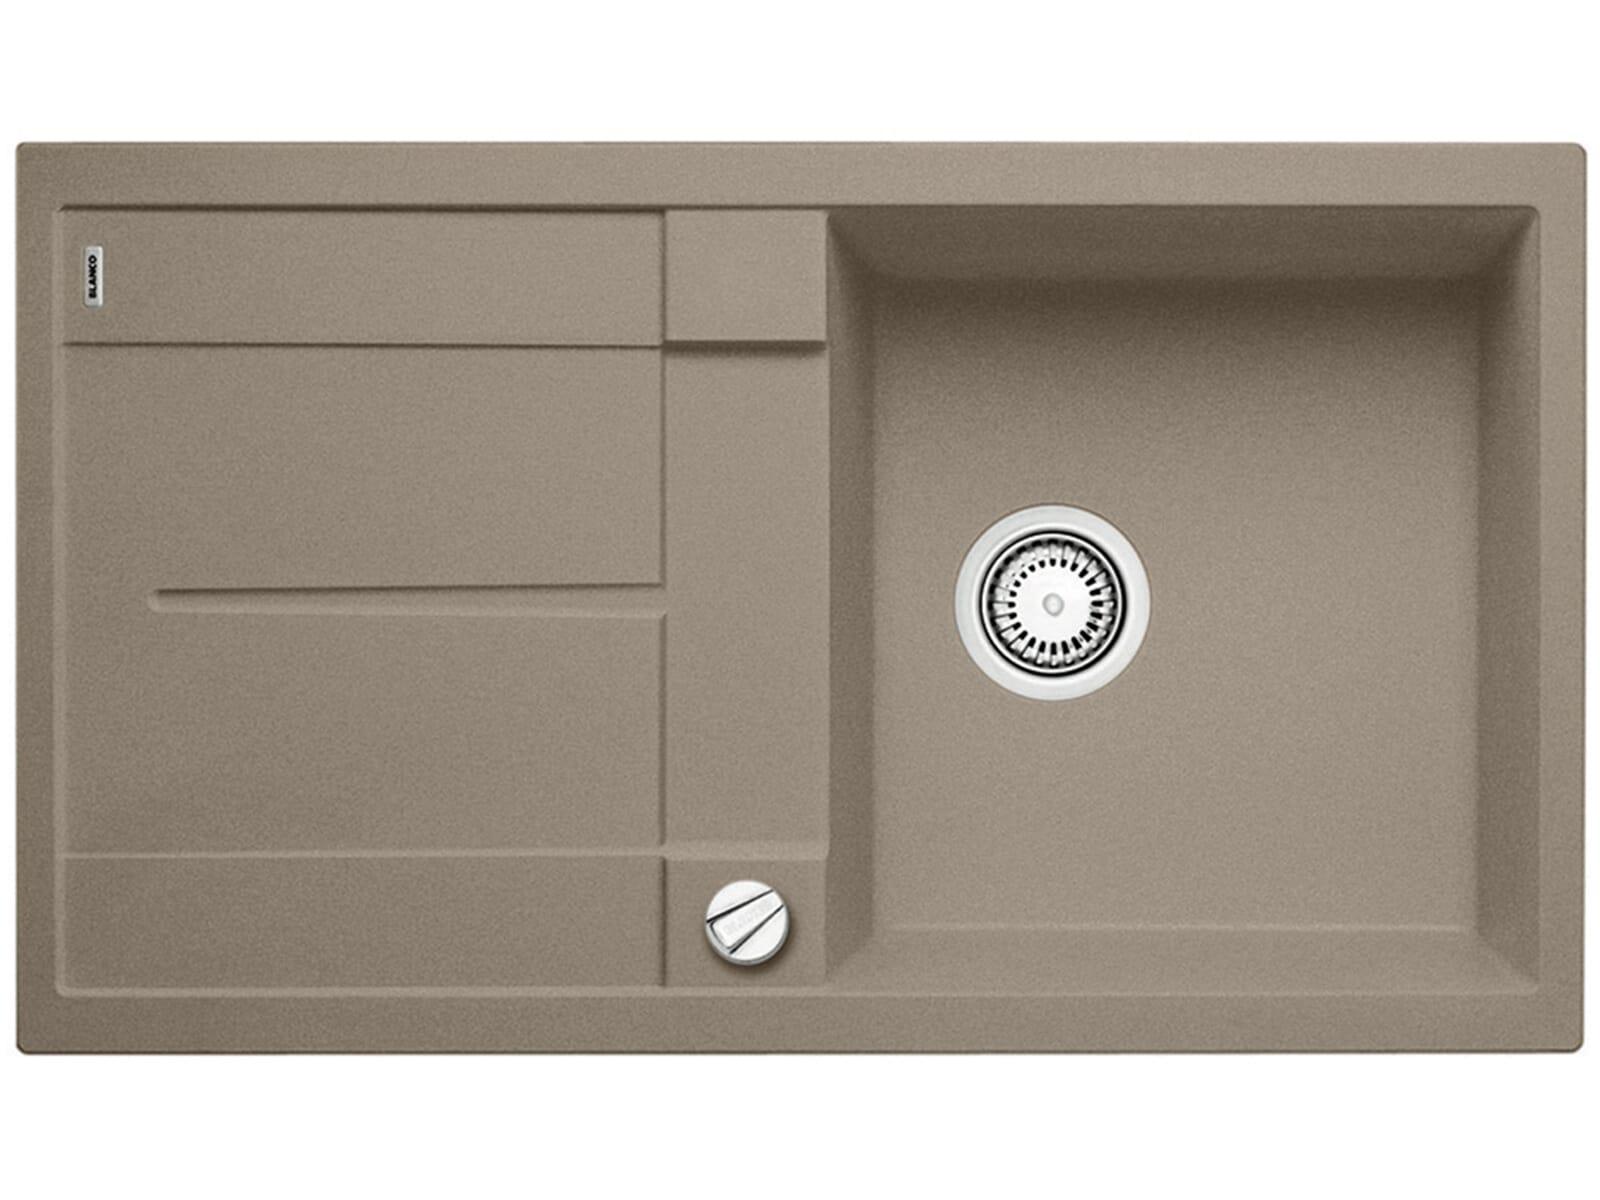 blanco metra 5 s tartufo granit sp le f r 254 90 eur. Black Bedroom Furniture Sets. Home Design Ideas